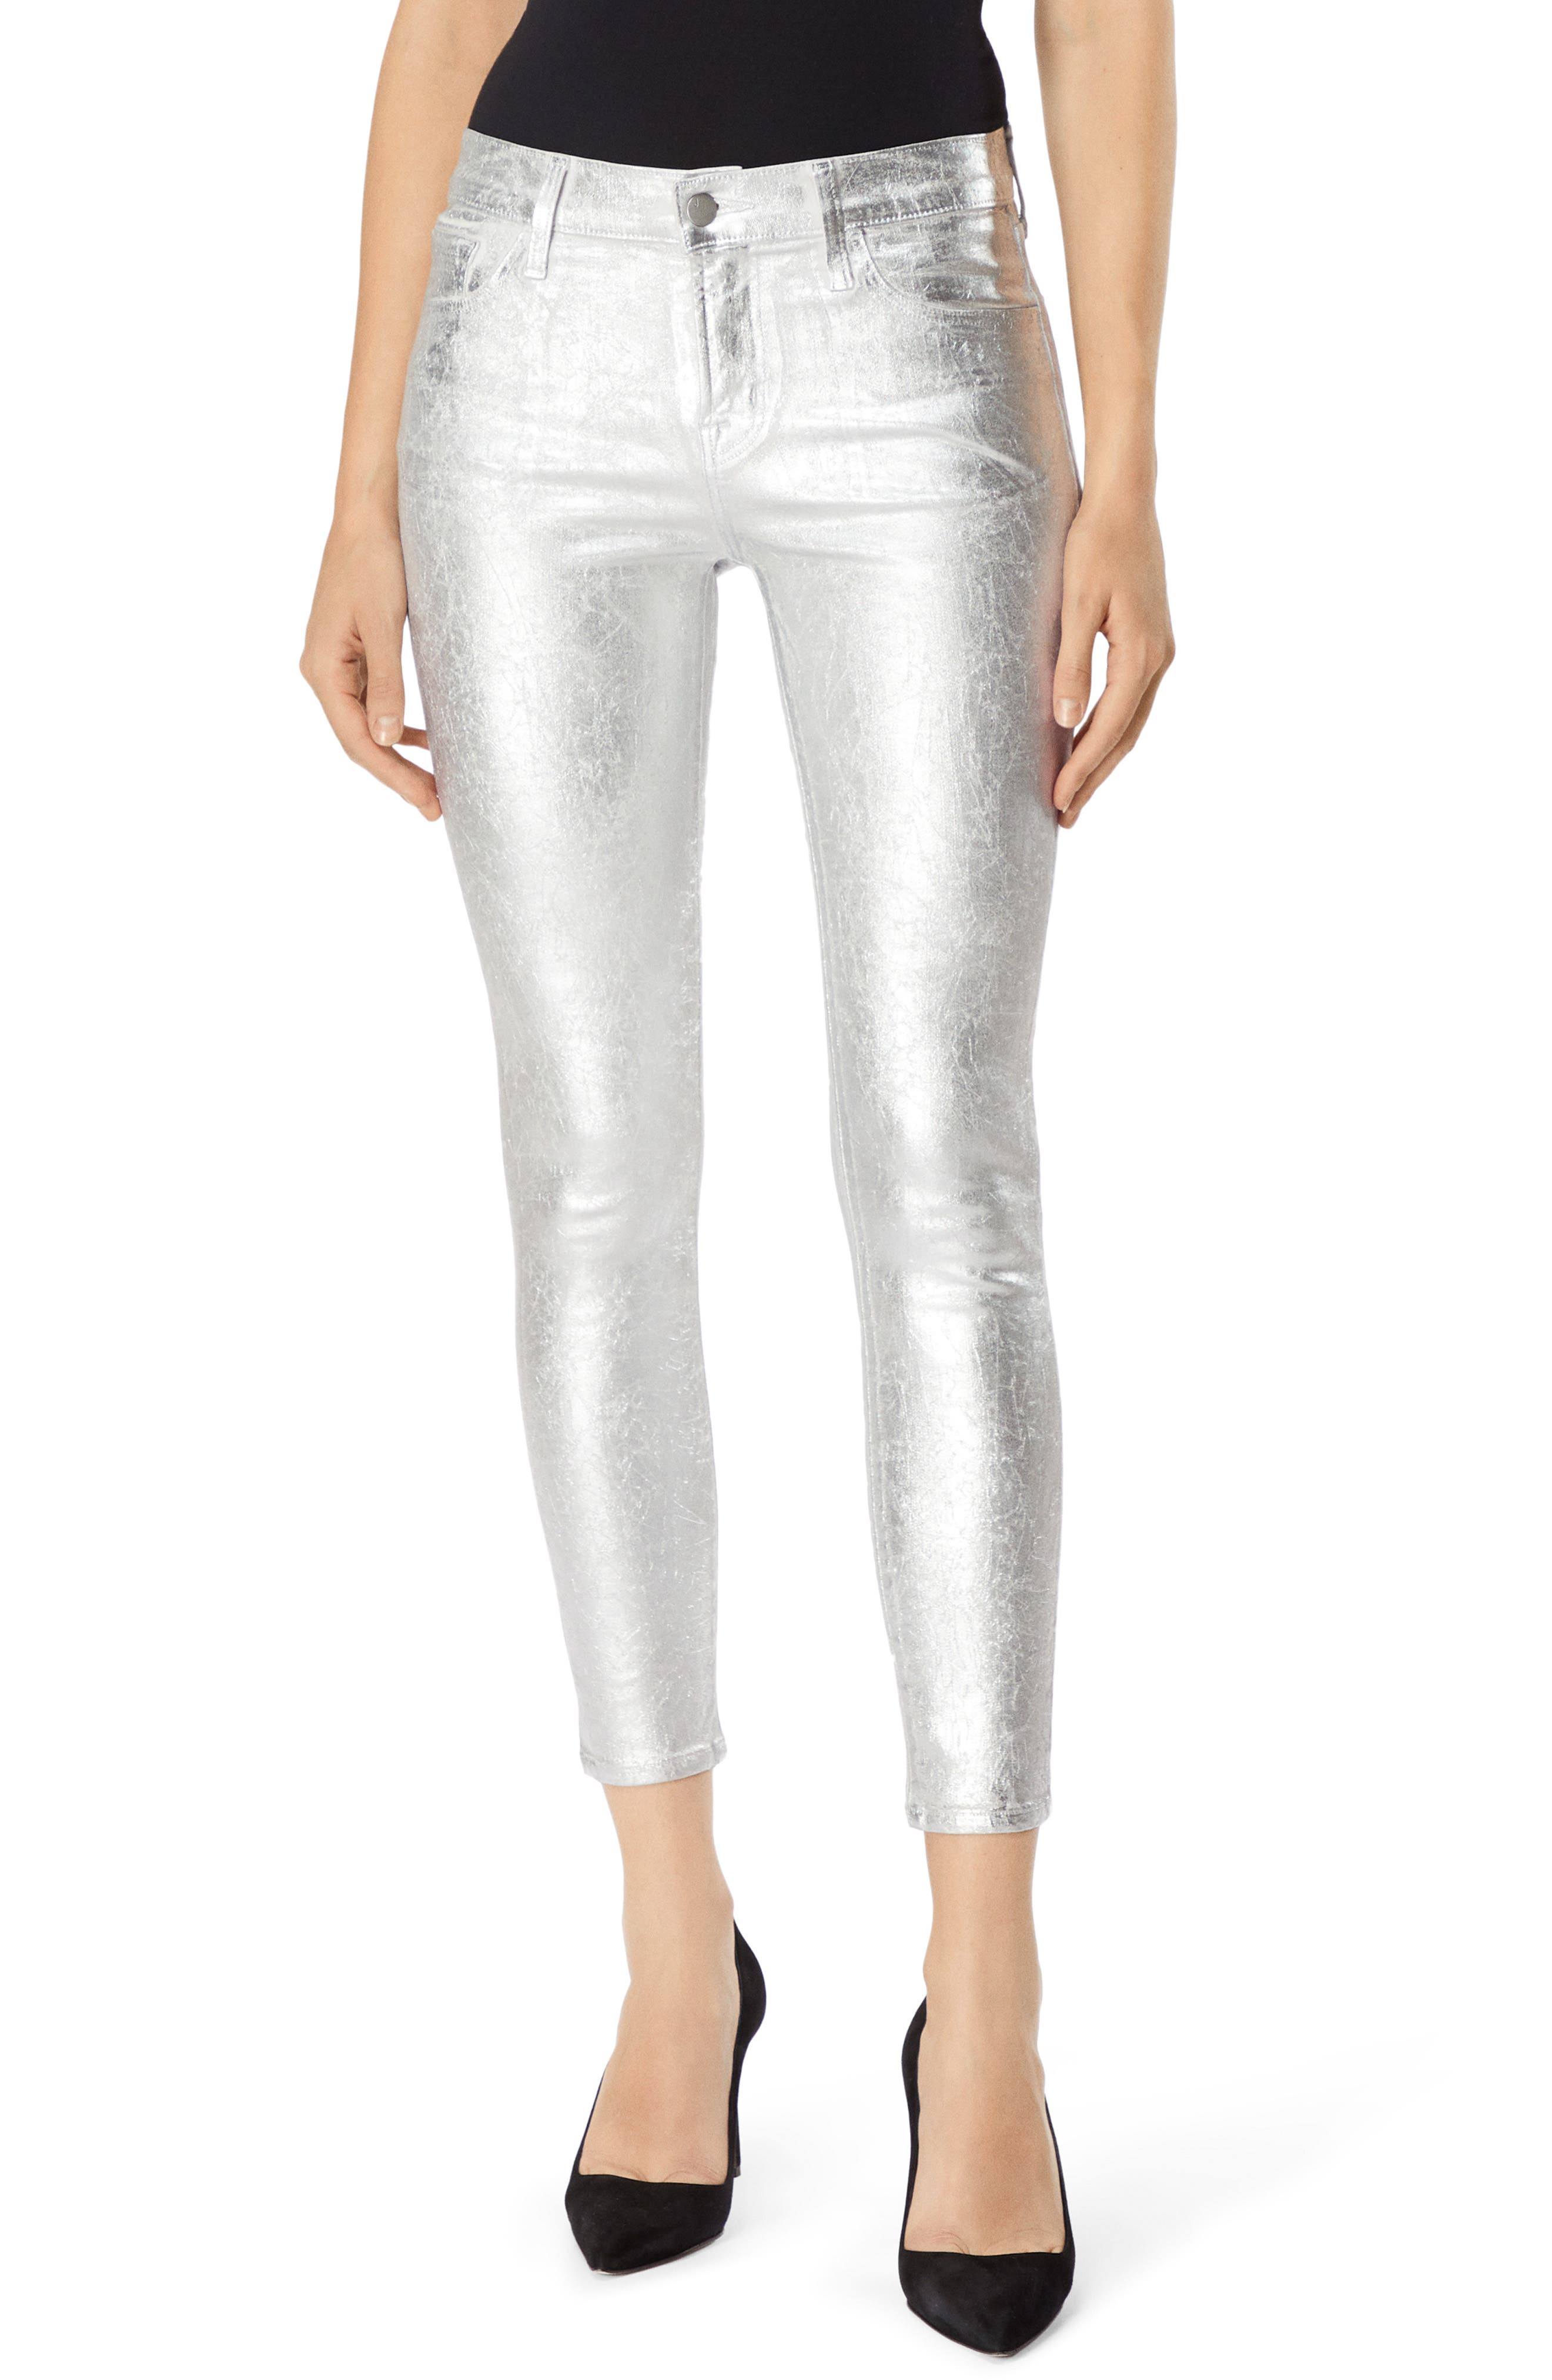 835 Capri Skinny Jeans,                             Main thumbnail 1, color,                             SUPERMOON CRISTALLINE